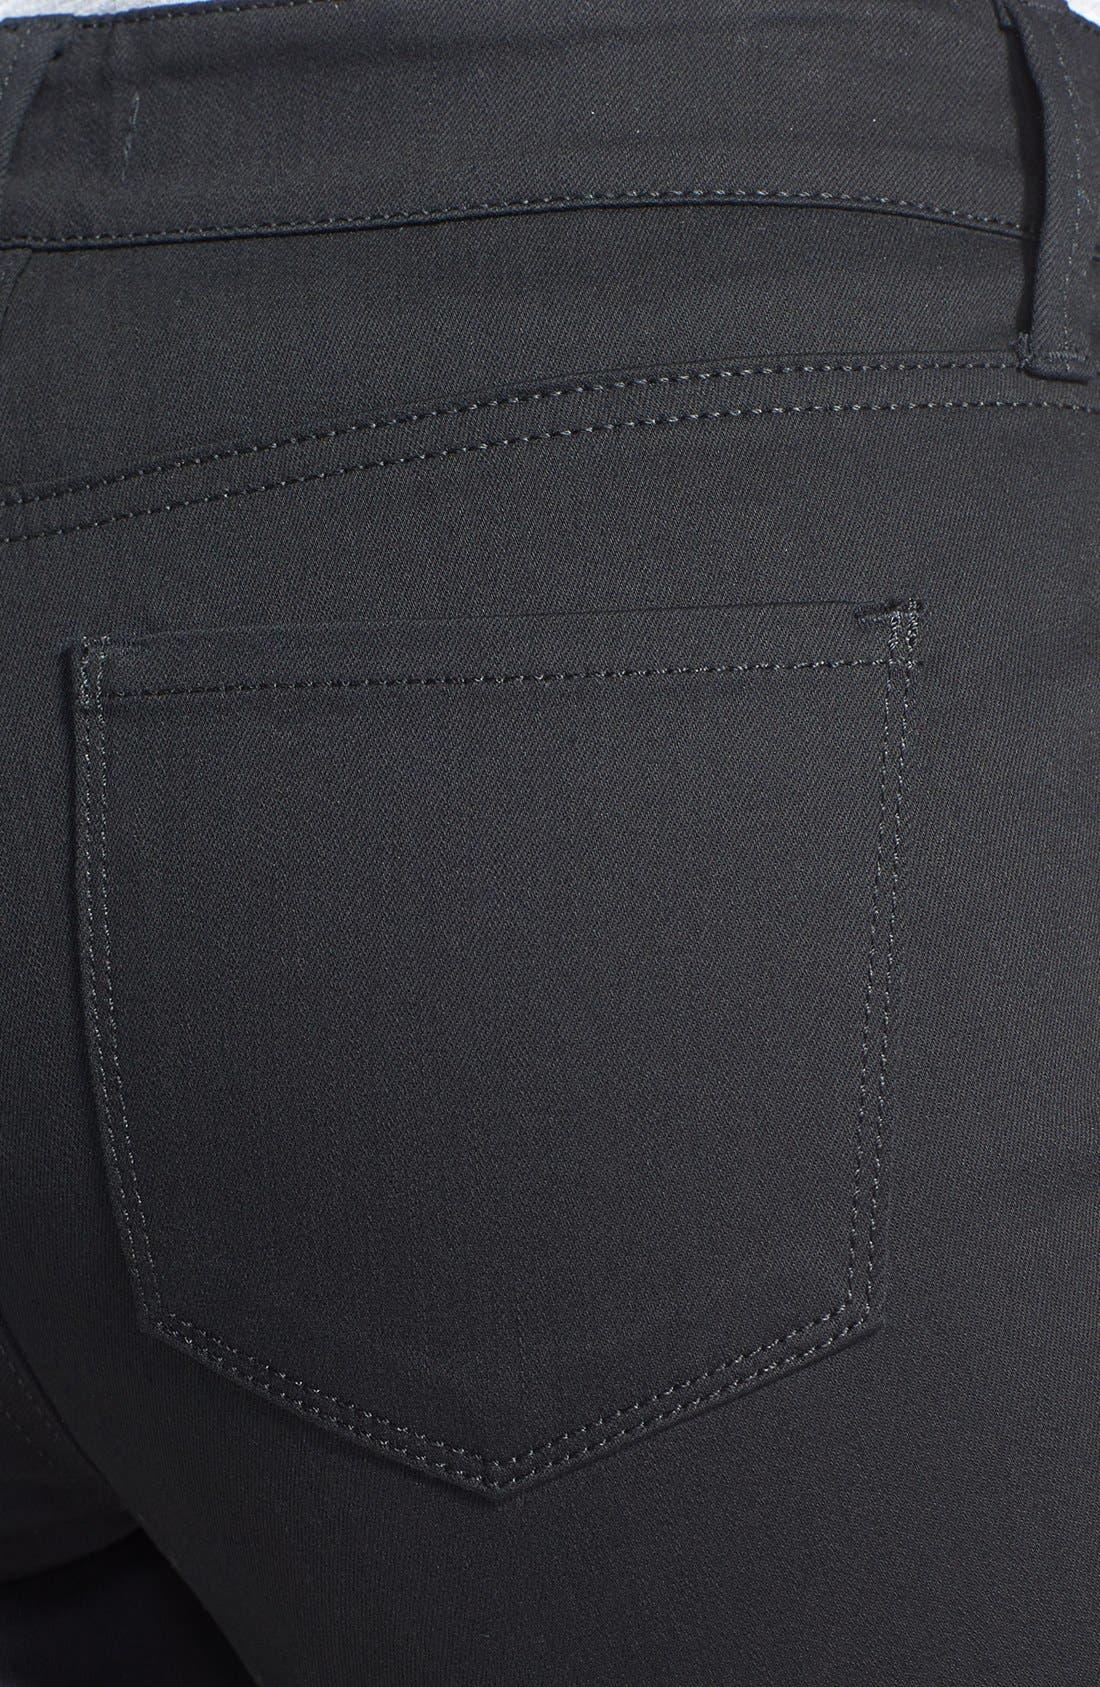 Alternate Image 3  - NYDJ 'Aurora' Two-Tone Stretch Skinny Jeans (Optic White/Black)